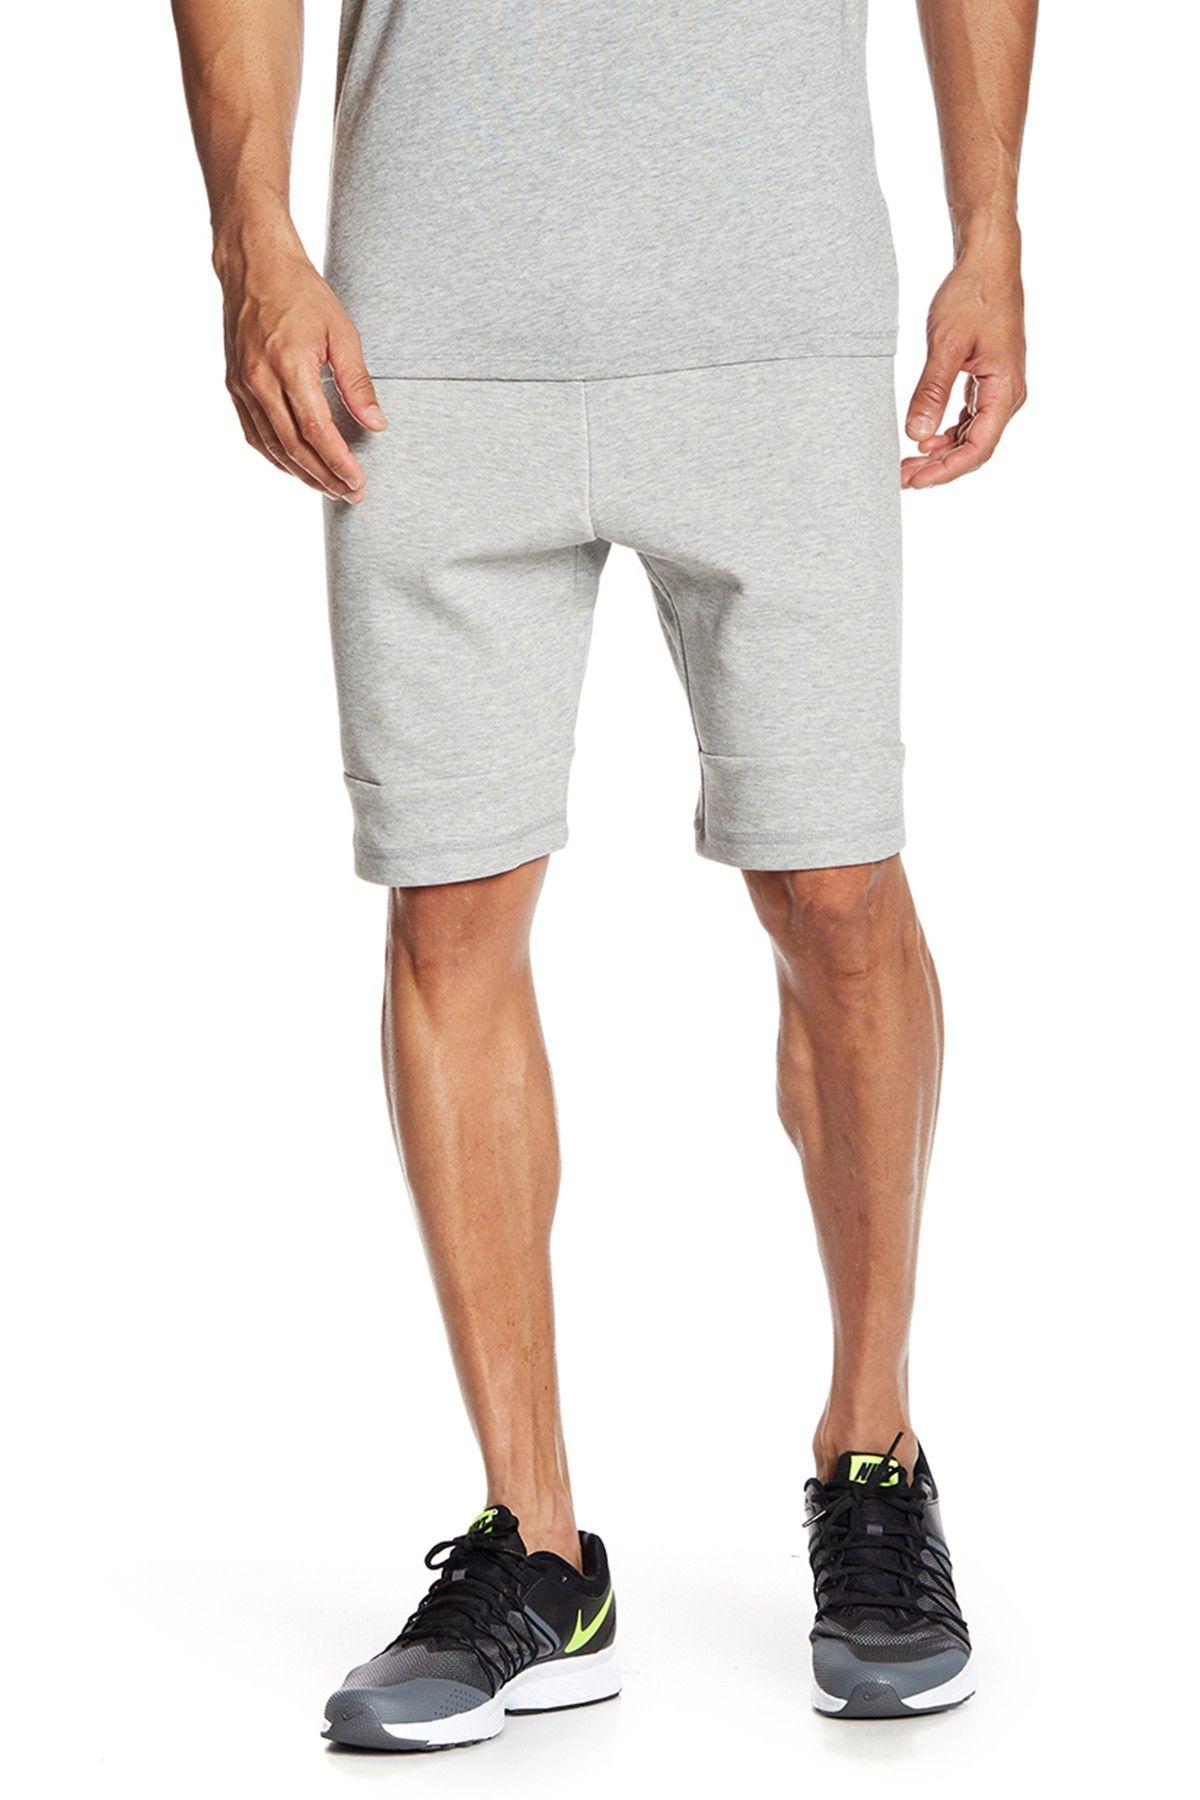 Nike Tech Fleece Shorts Fleece shorts, Nike tech